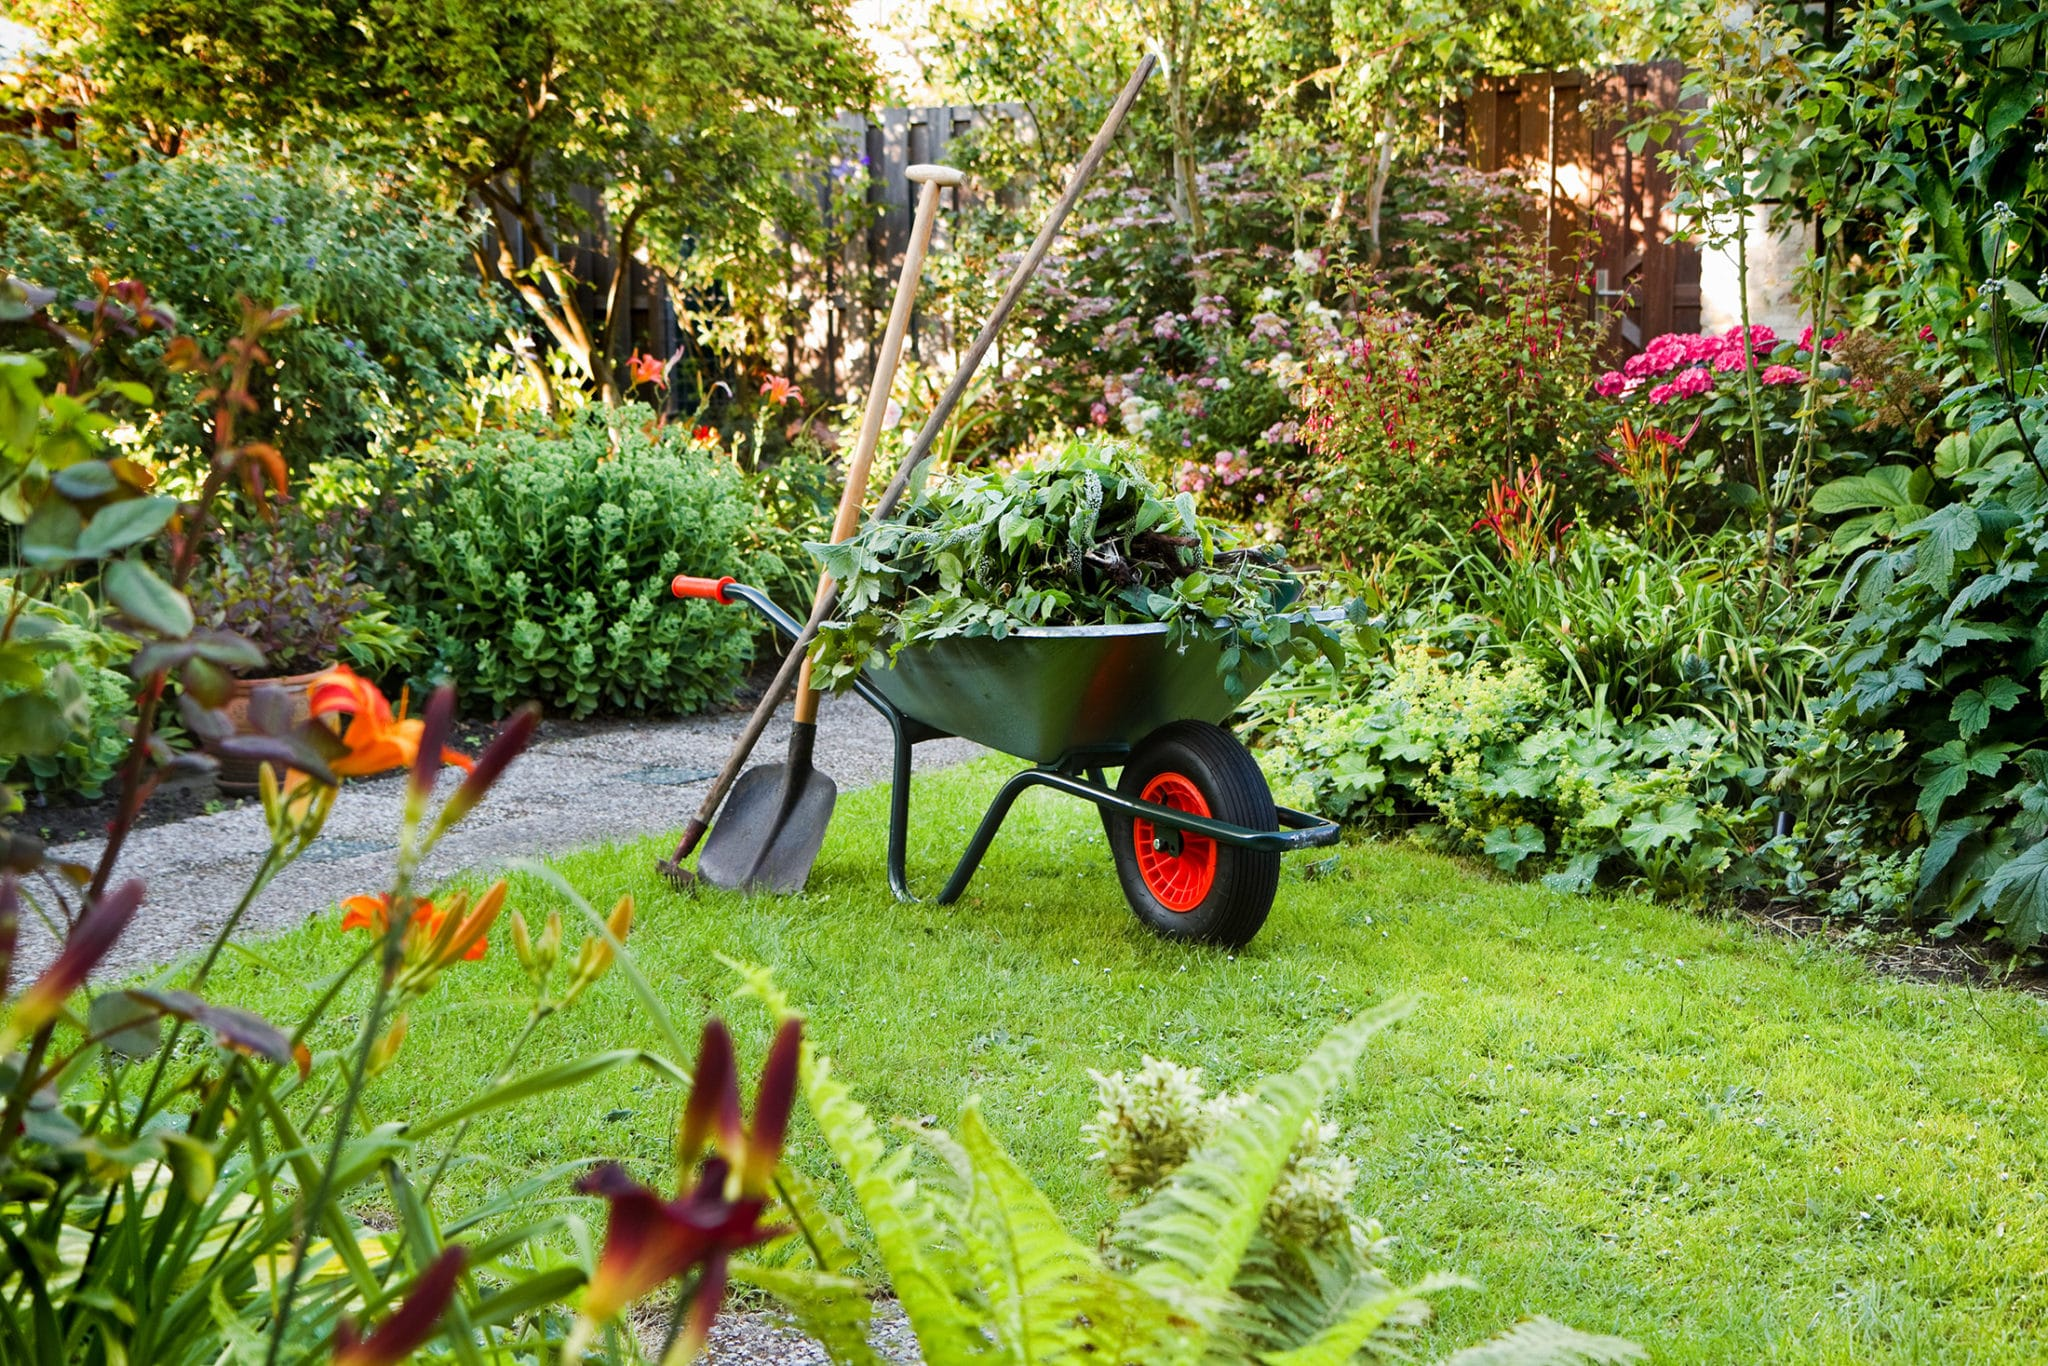 Summer holiday garden care